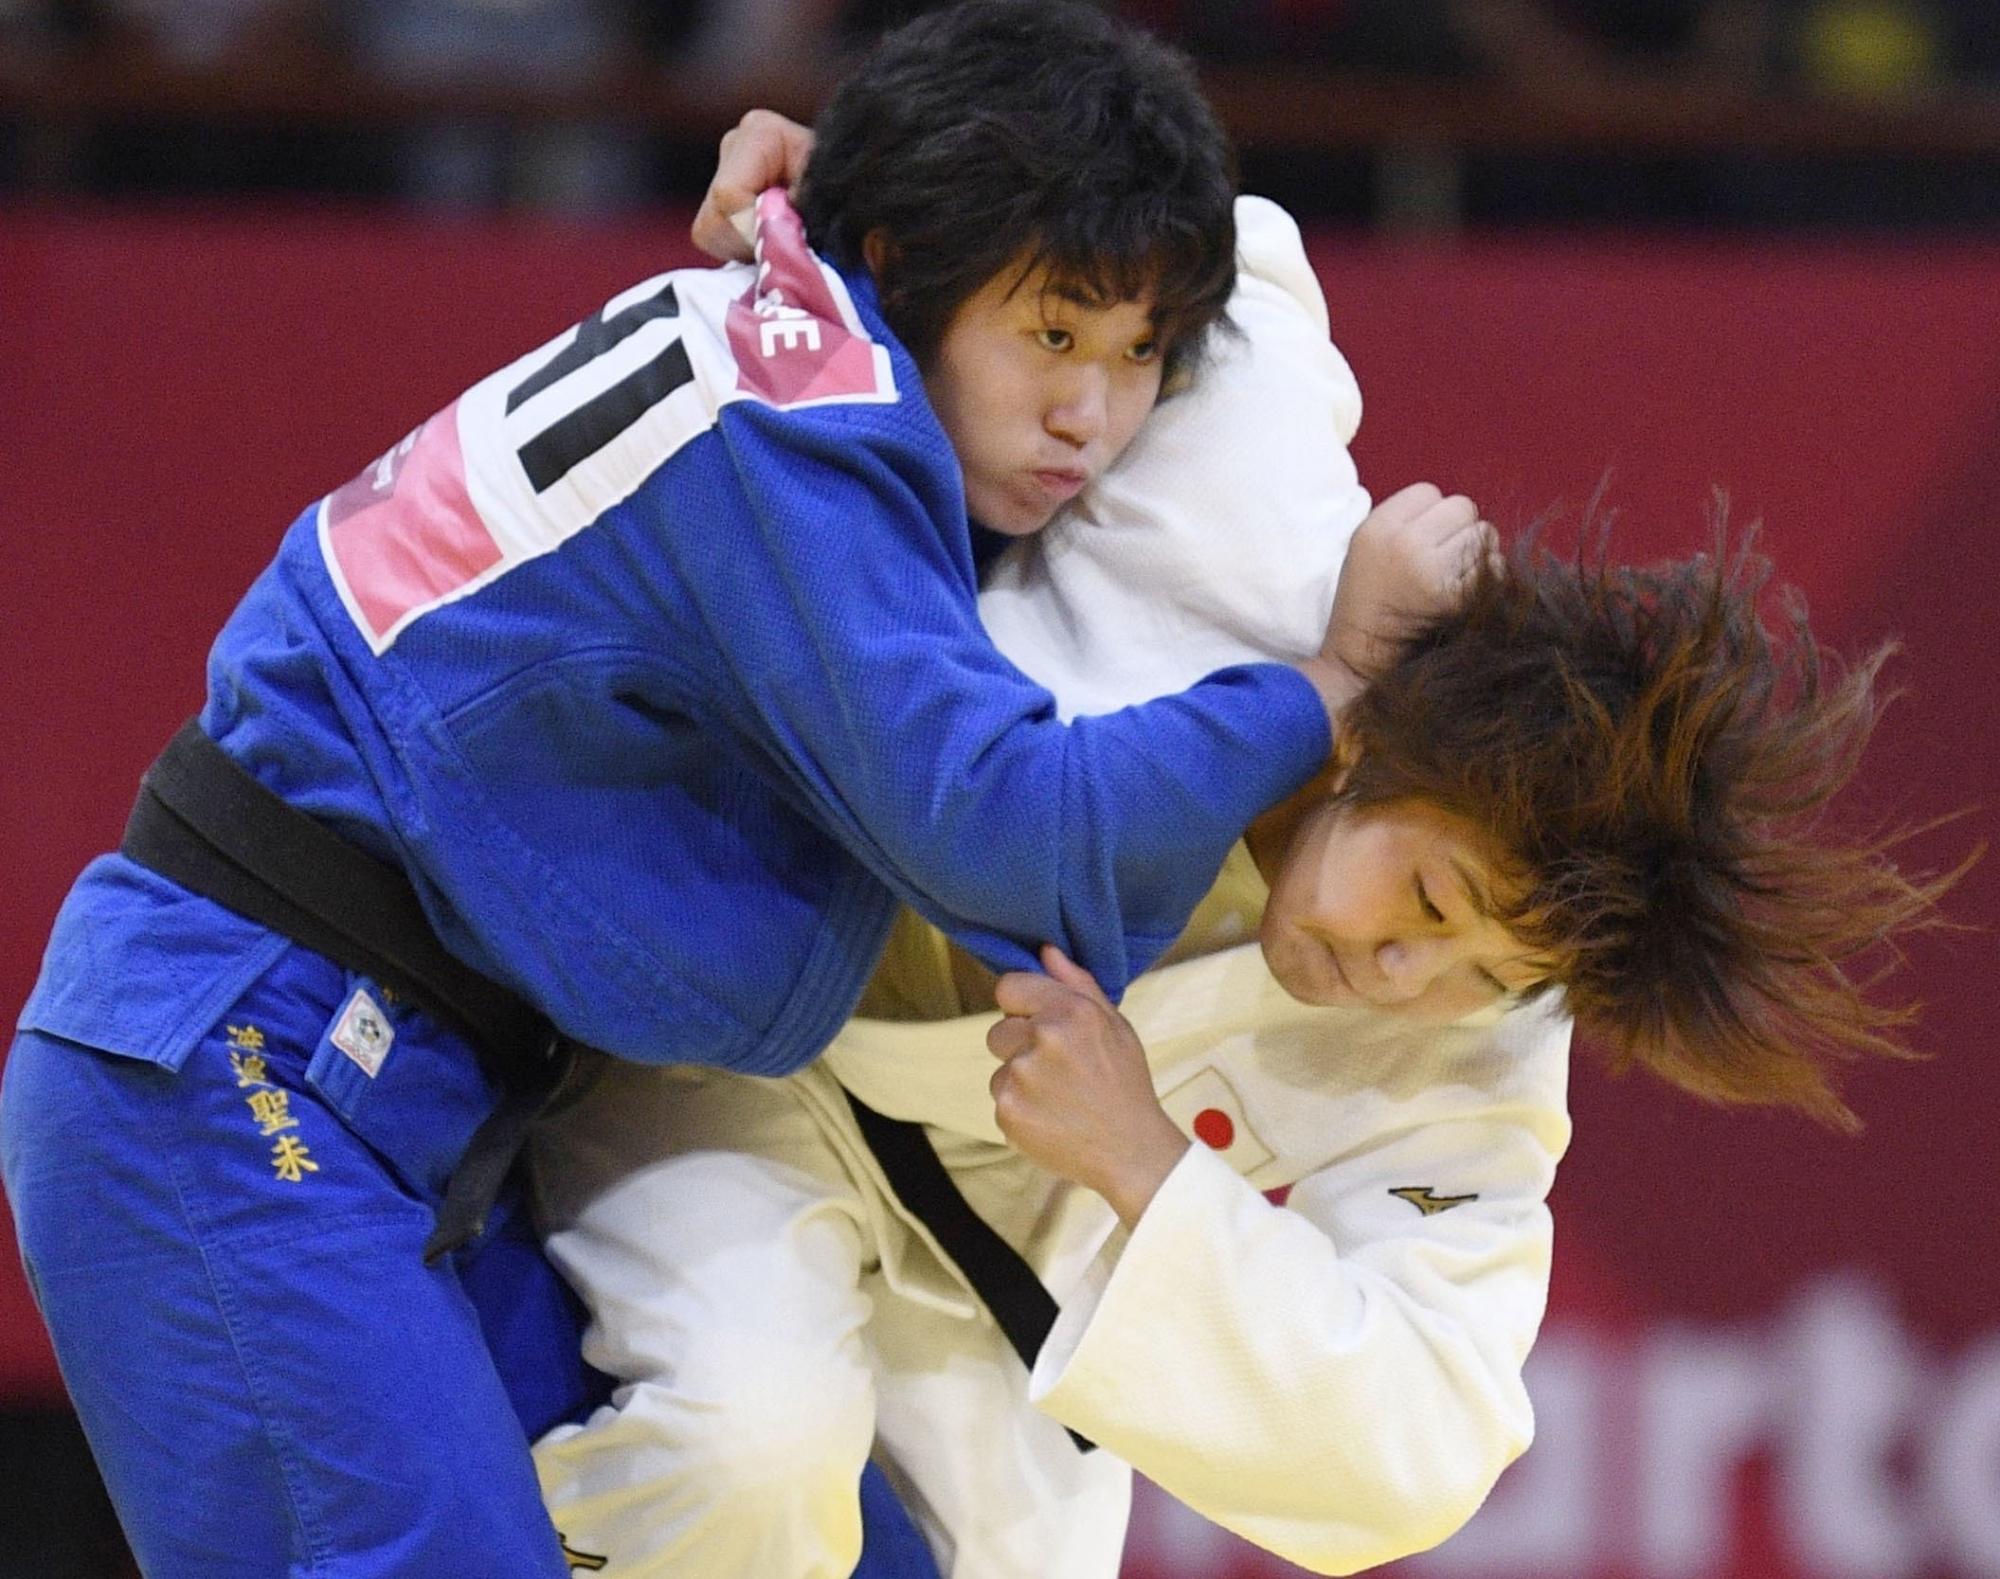 Representing Philippines, Kiyomi Watanabe wins historic medal in Judo at Asian Games 2018